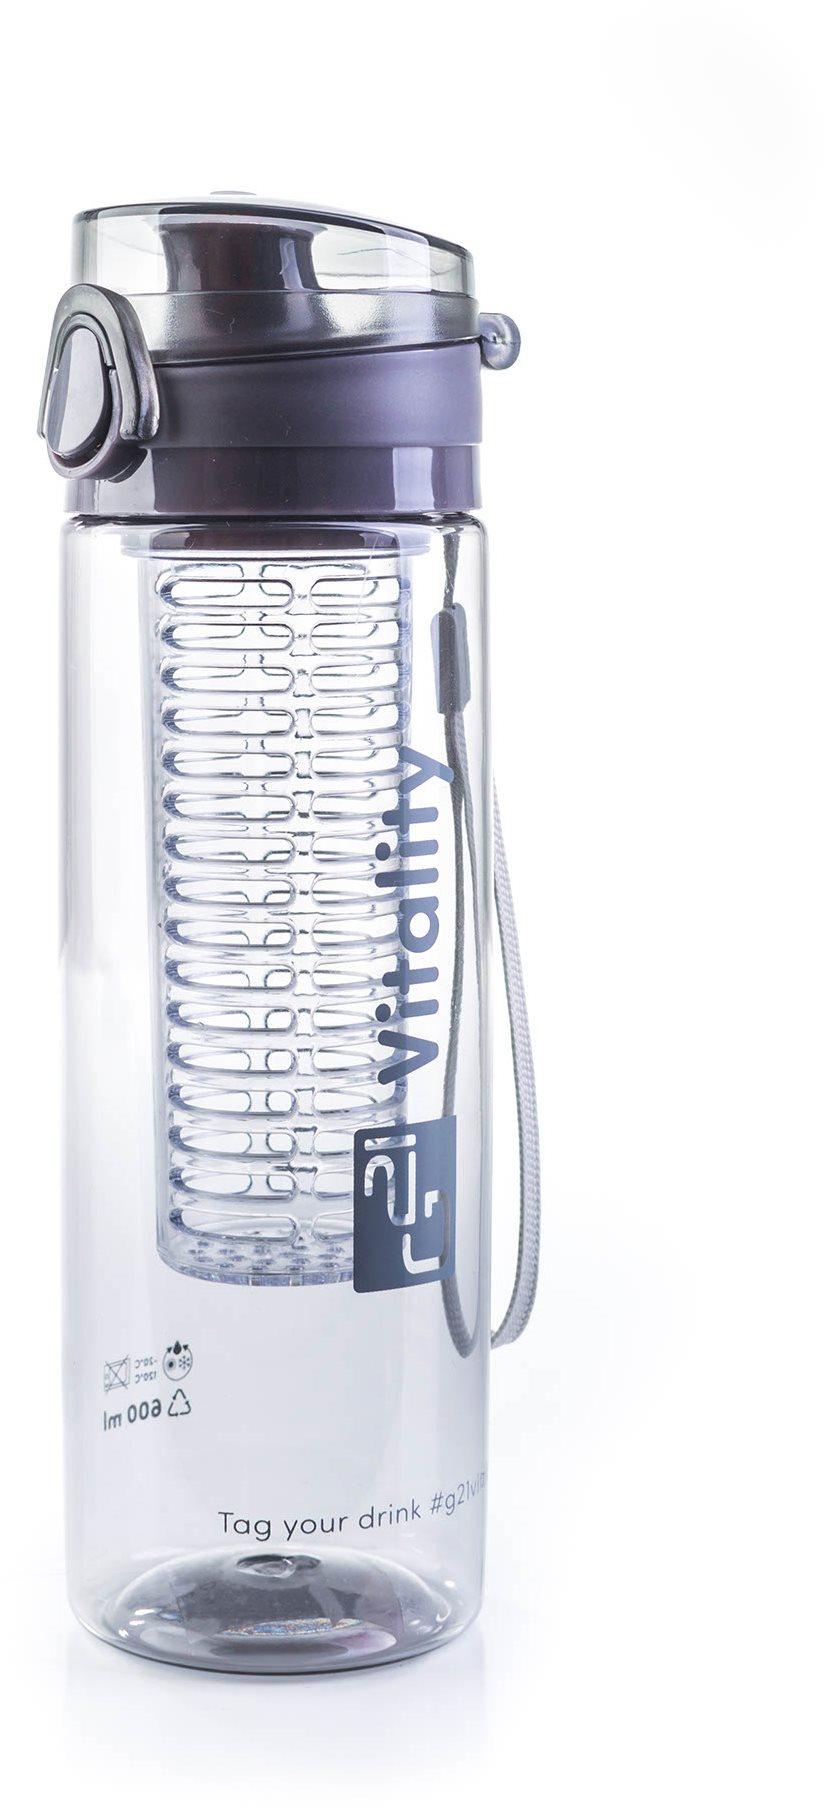 G21 Smoothie/juice palack, 600 ml, szürke